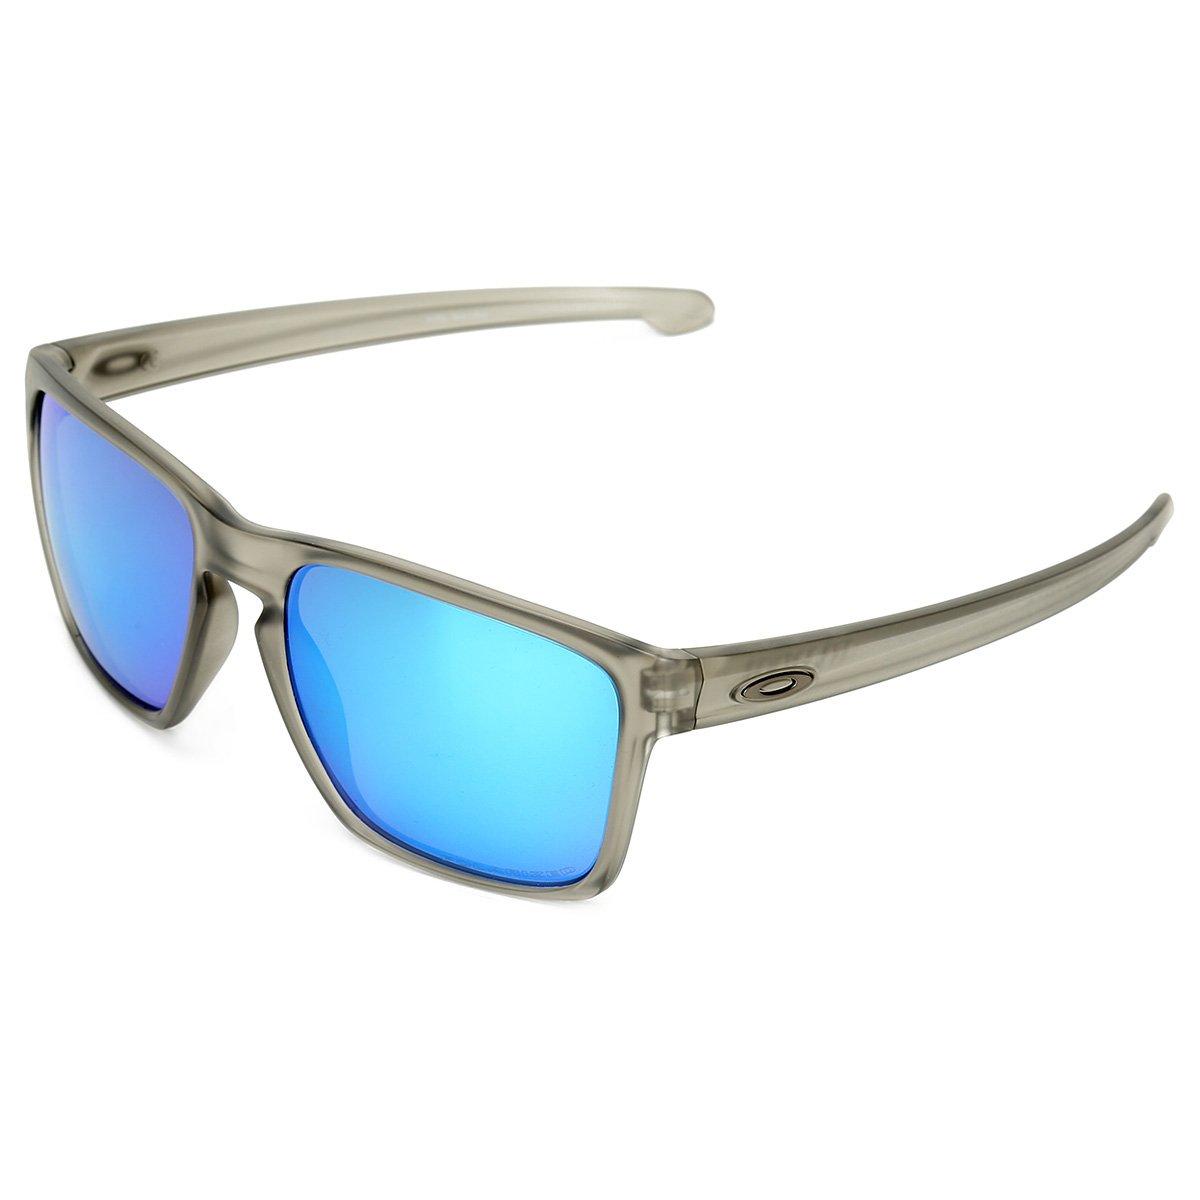 e4730c8ac5b5d Óculos de Sol Oakley Sliver Xl Masculino - Cinza e Azul - Compre Agora